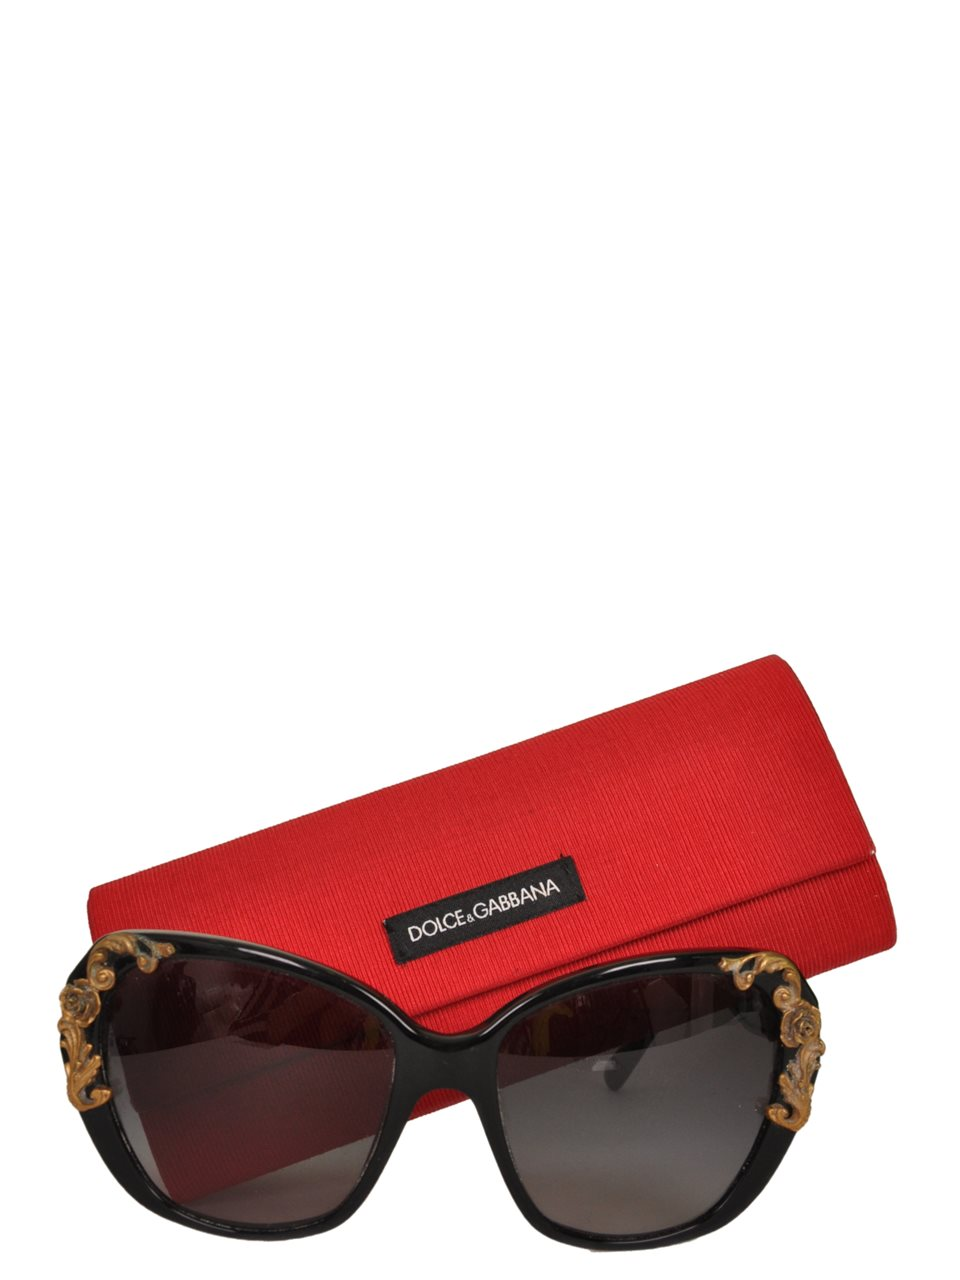 Dolce & Gabbana - Sicilian Baroque Sunglasses - Image 4 of 4